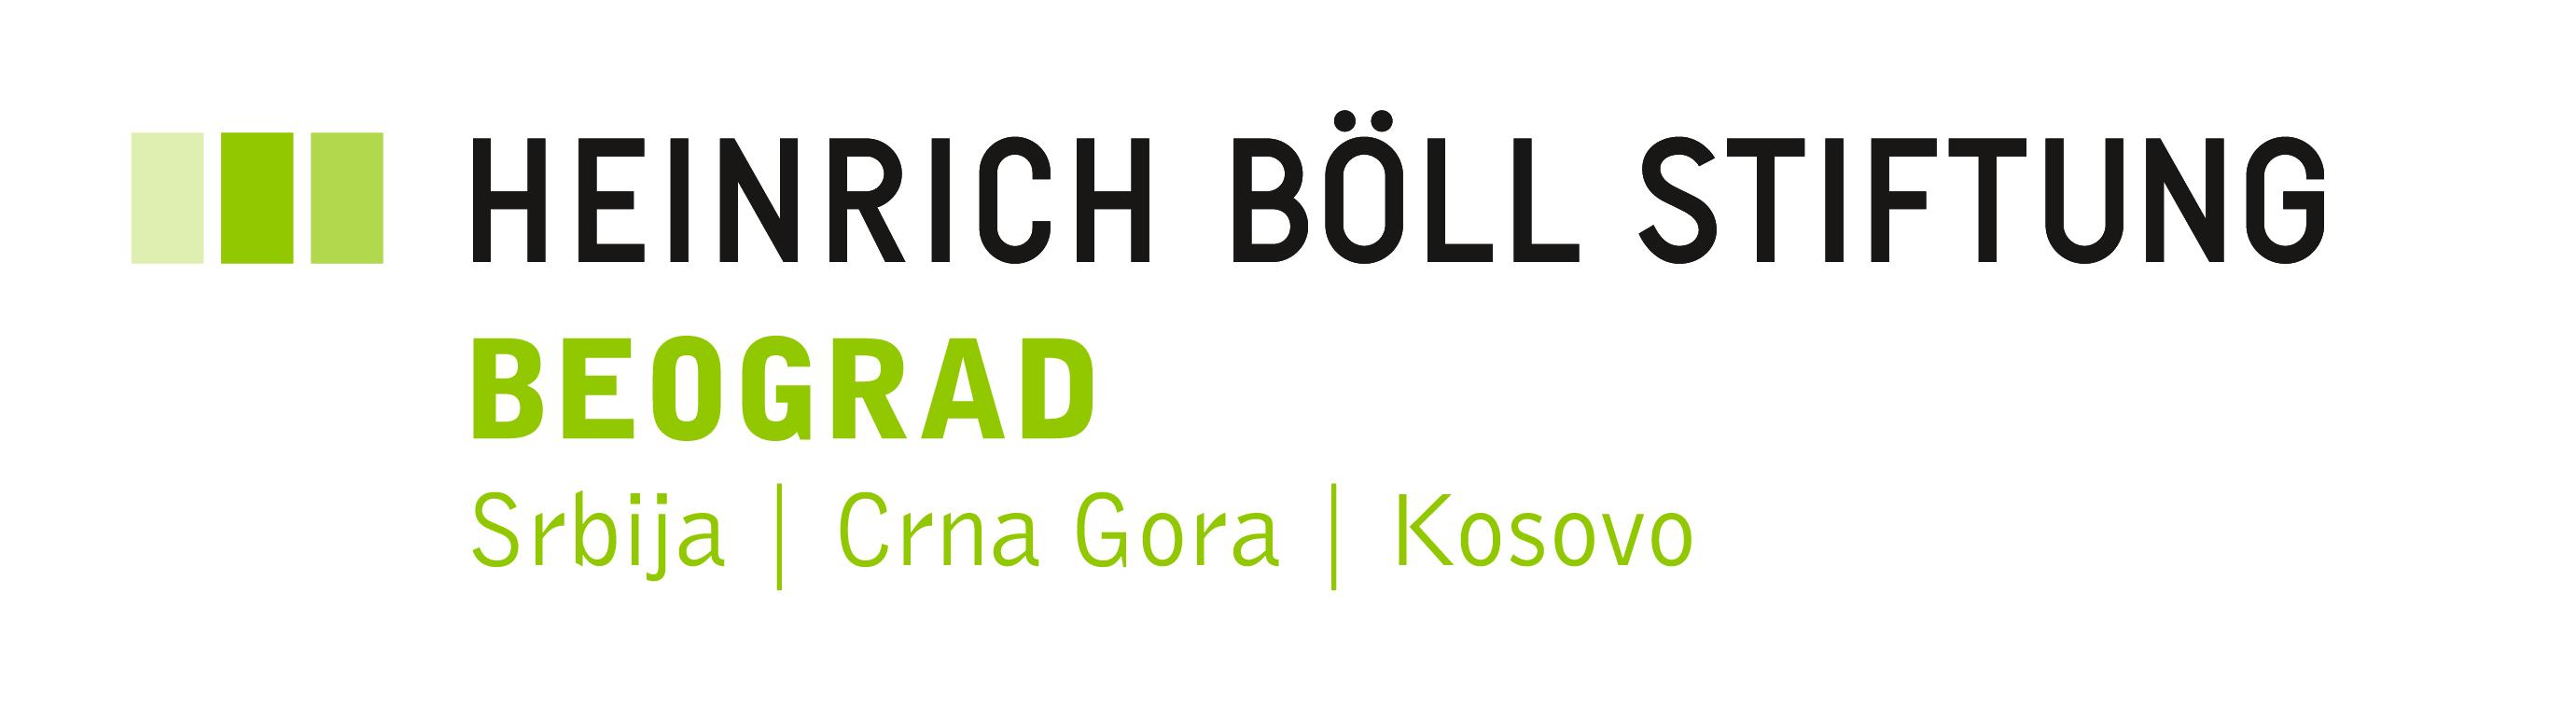 Fondacija Heinrich Boell